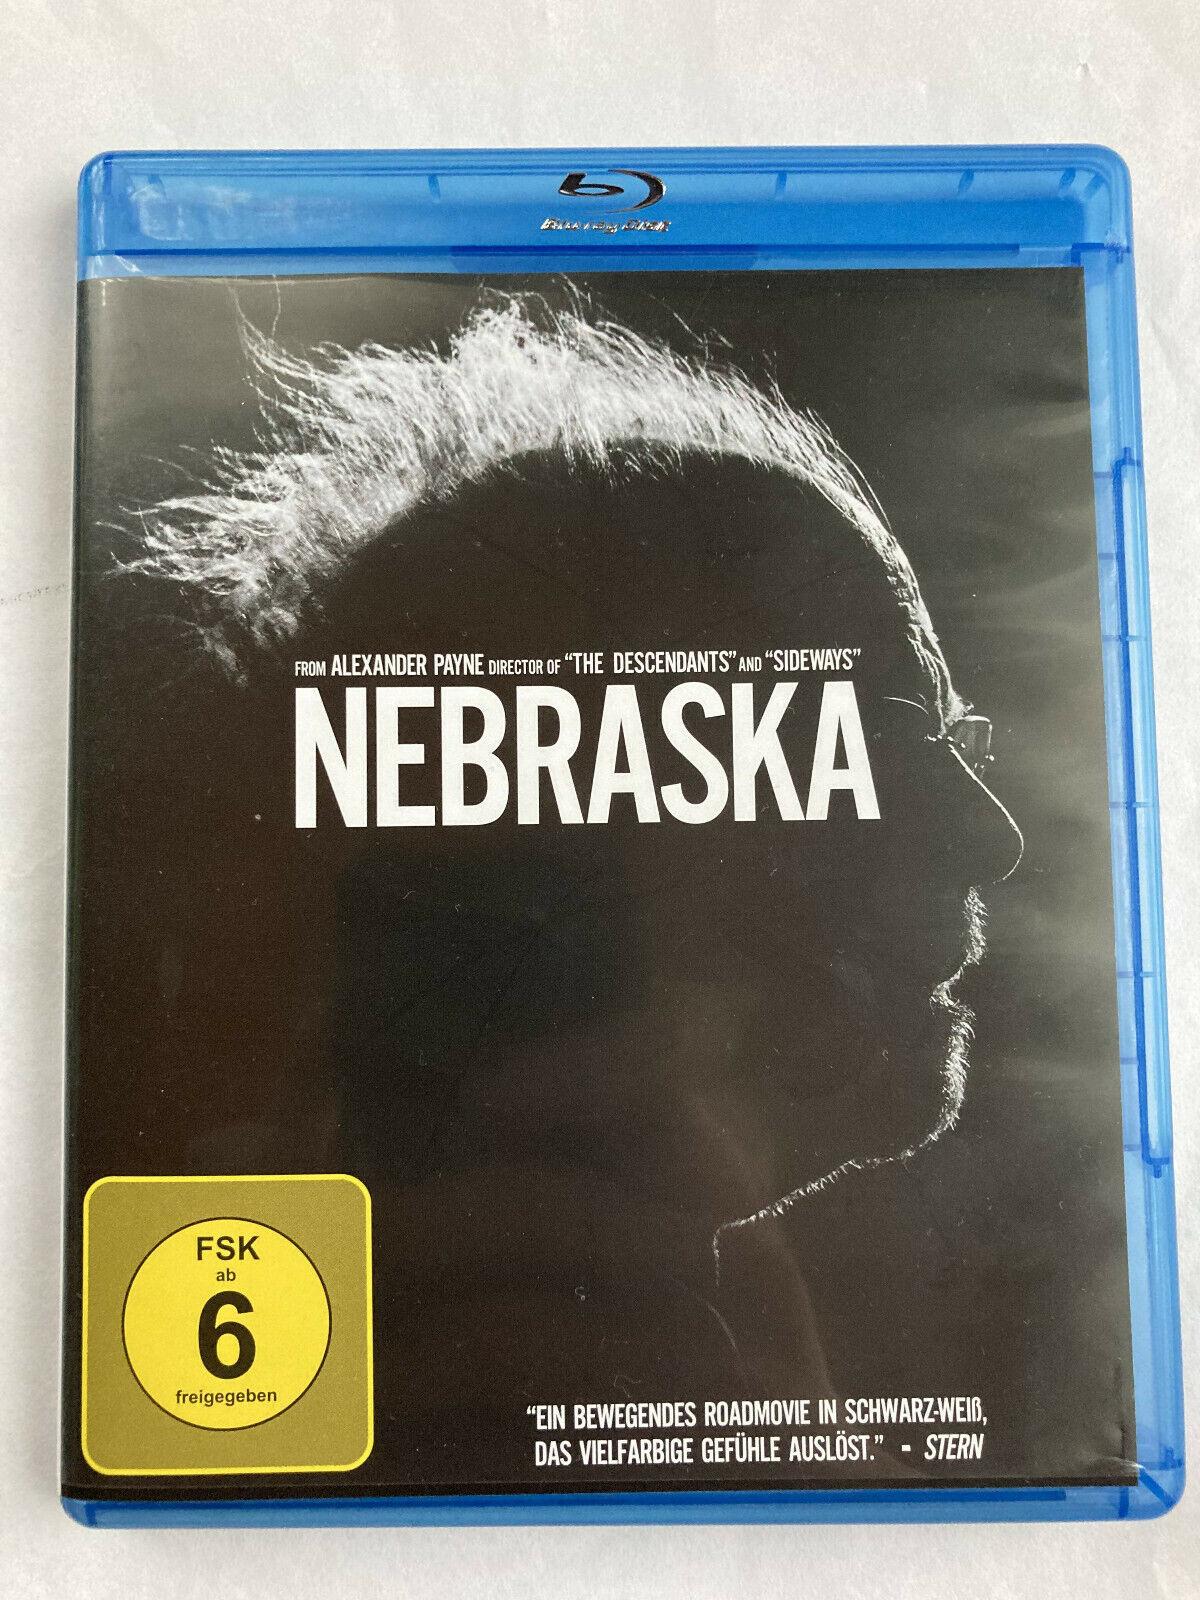 Nebraska - Blu-ray - Alexander Payne - Film